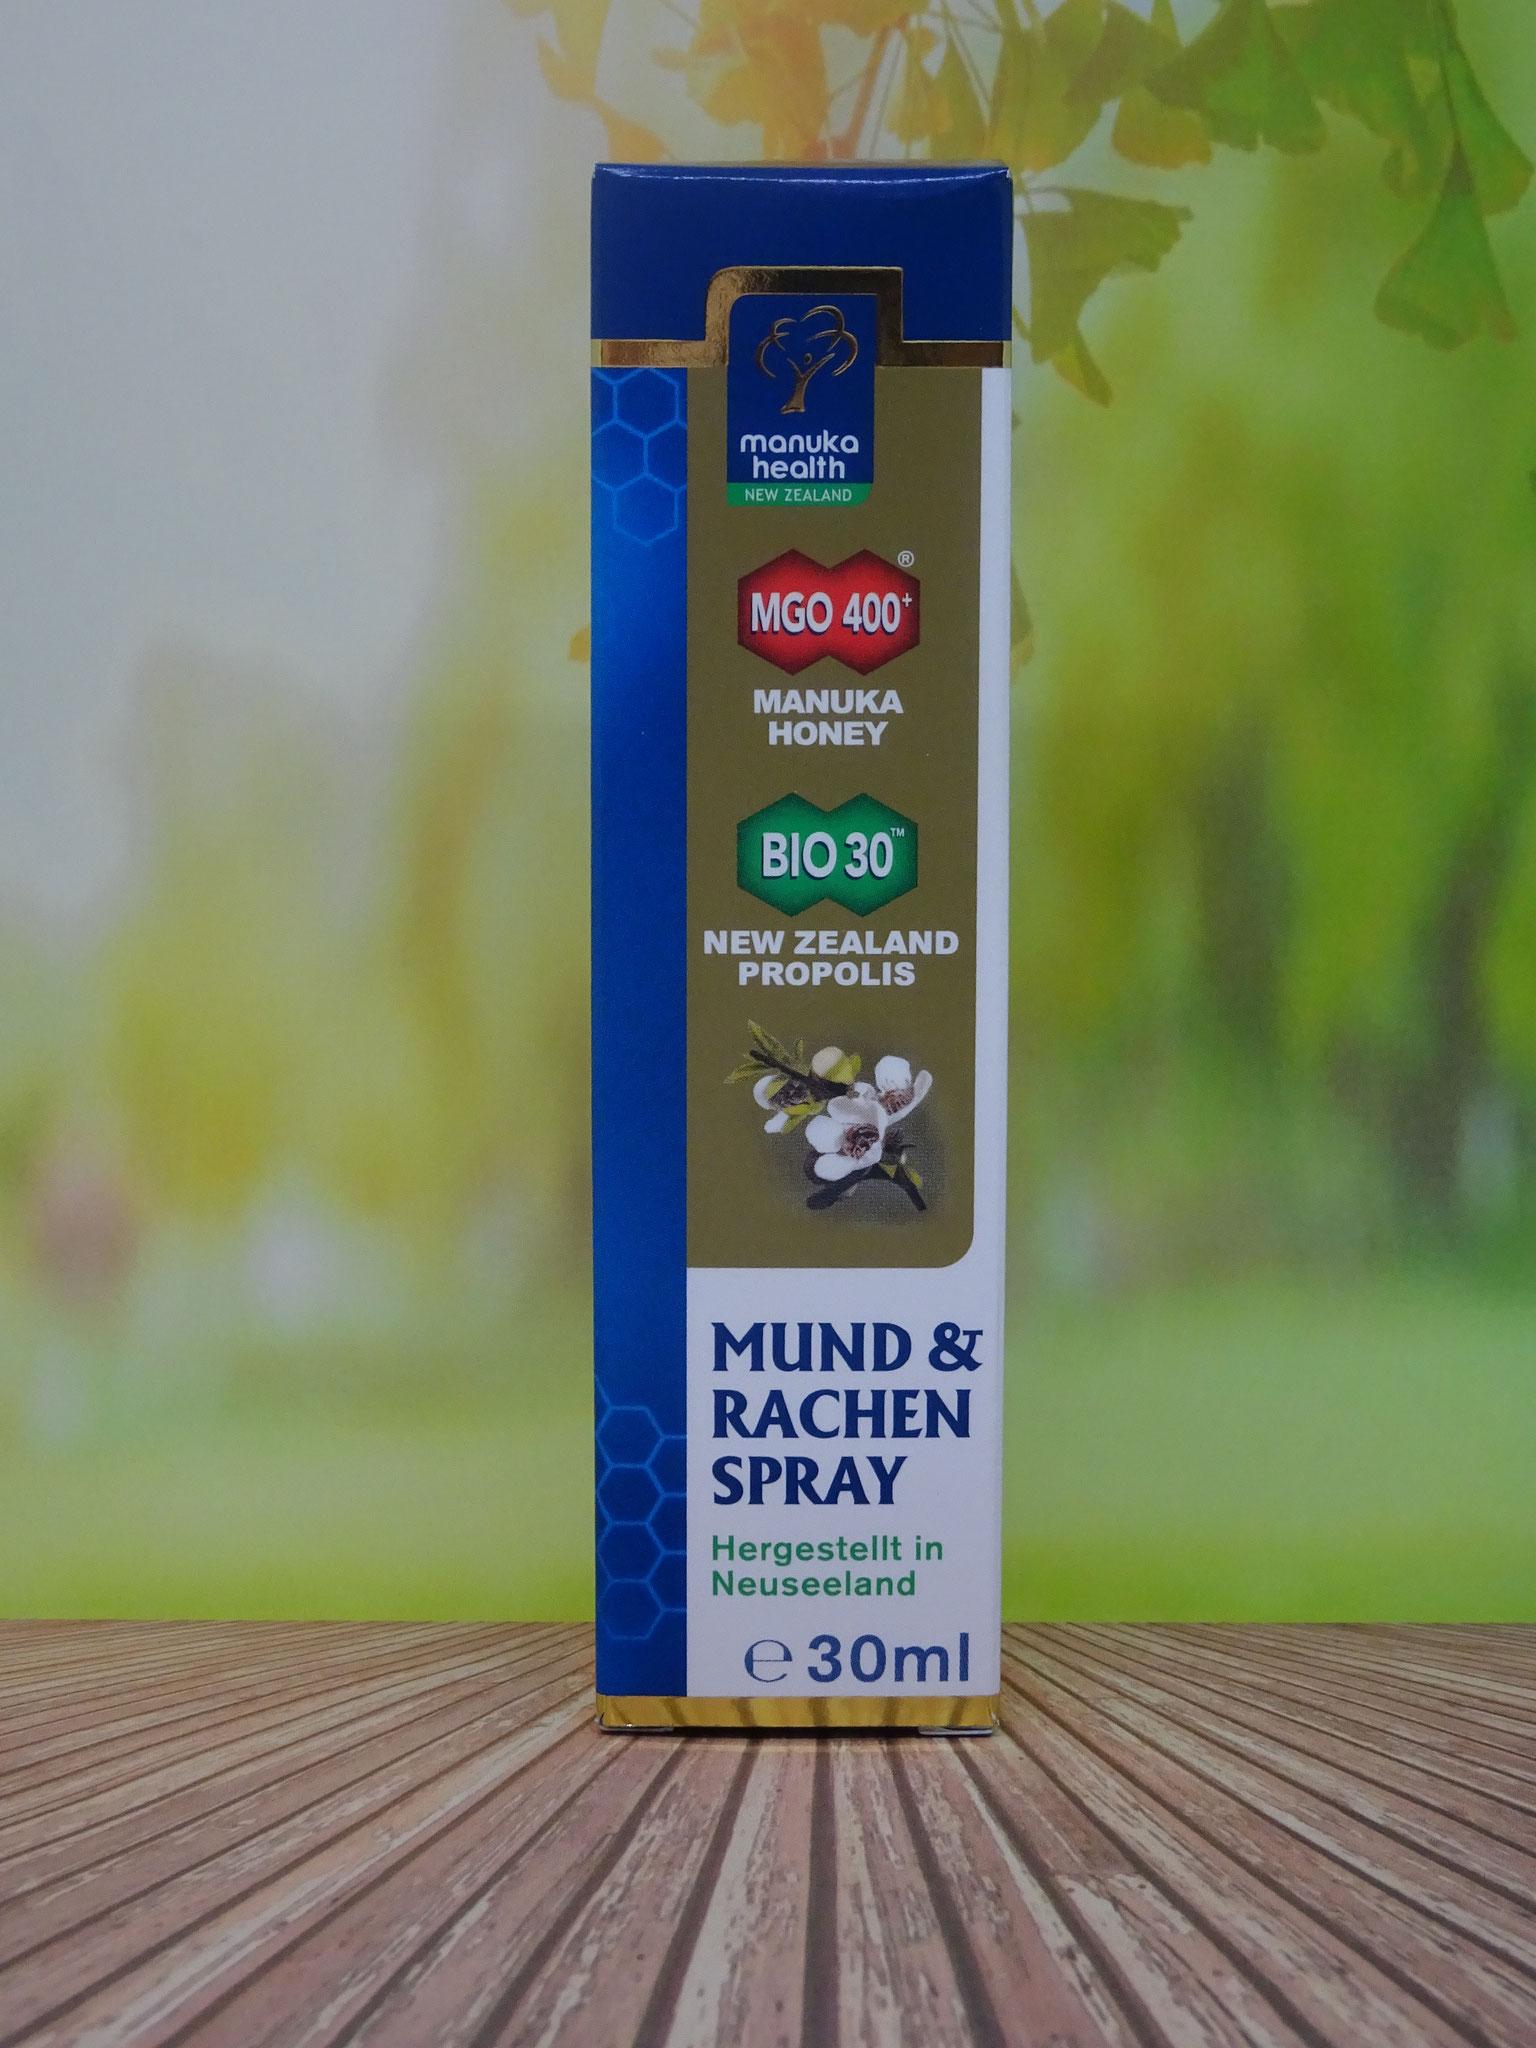 Manuka Honig Mund- und Rachenspray MGO 400 30ml (Manuka Health New Zealand)